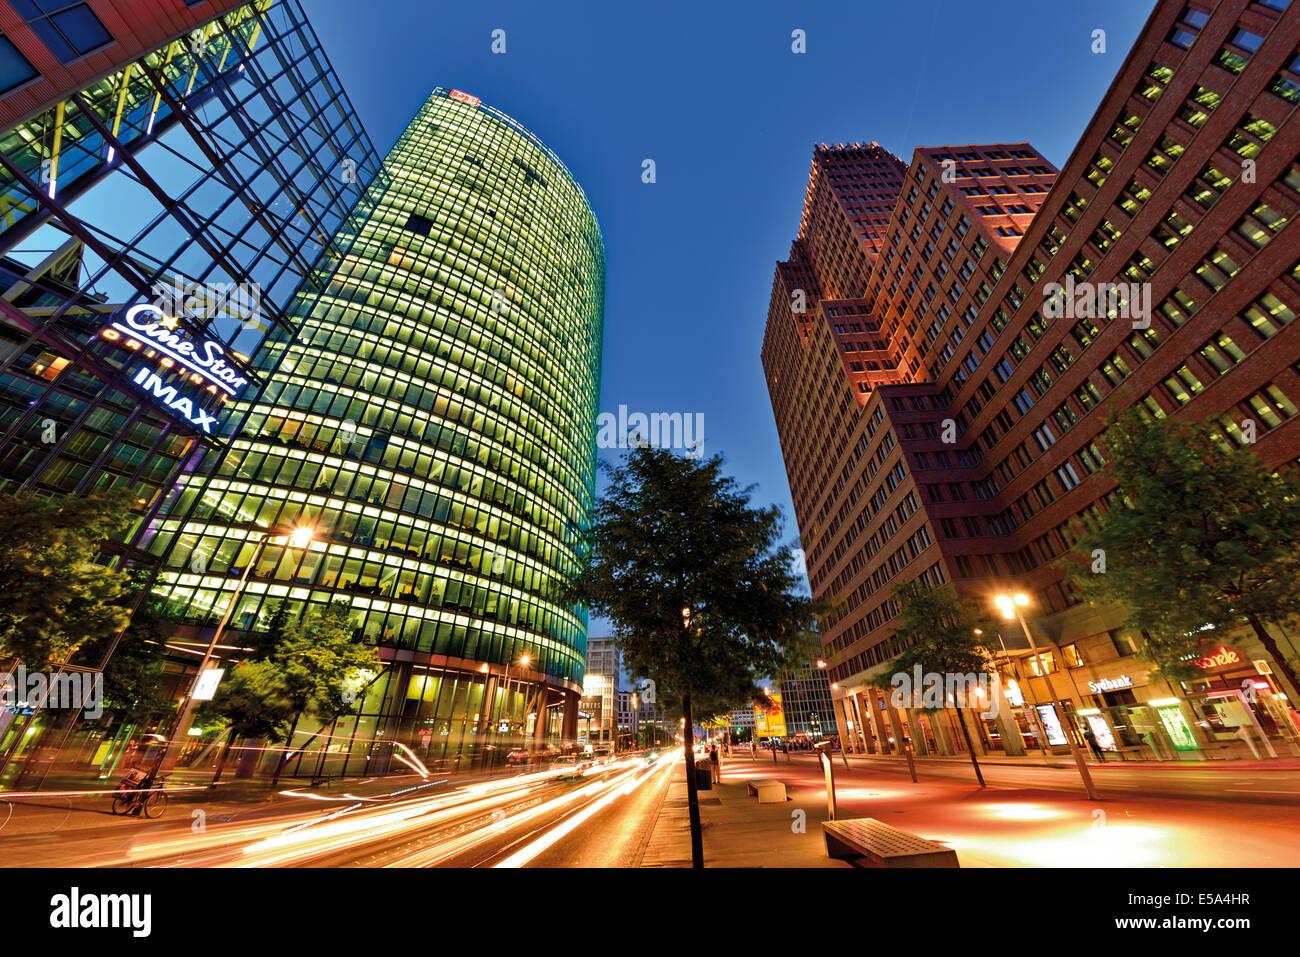 Germany, Berlin: Nocturnal view of the Potsdam Square (Potsdamer Platz) - Stock Image